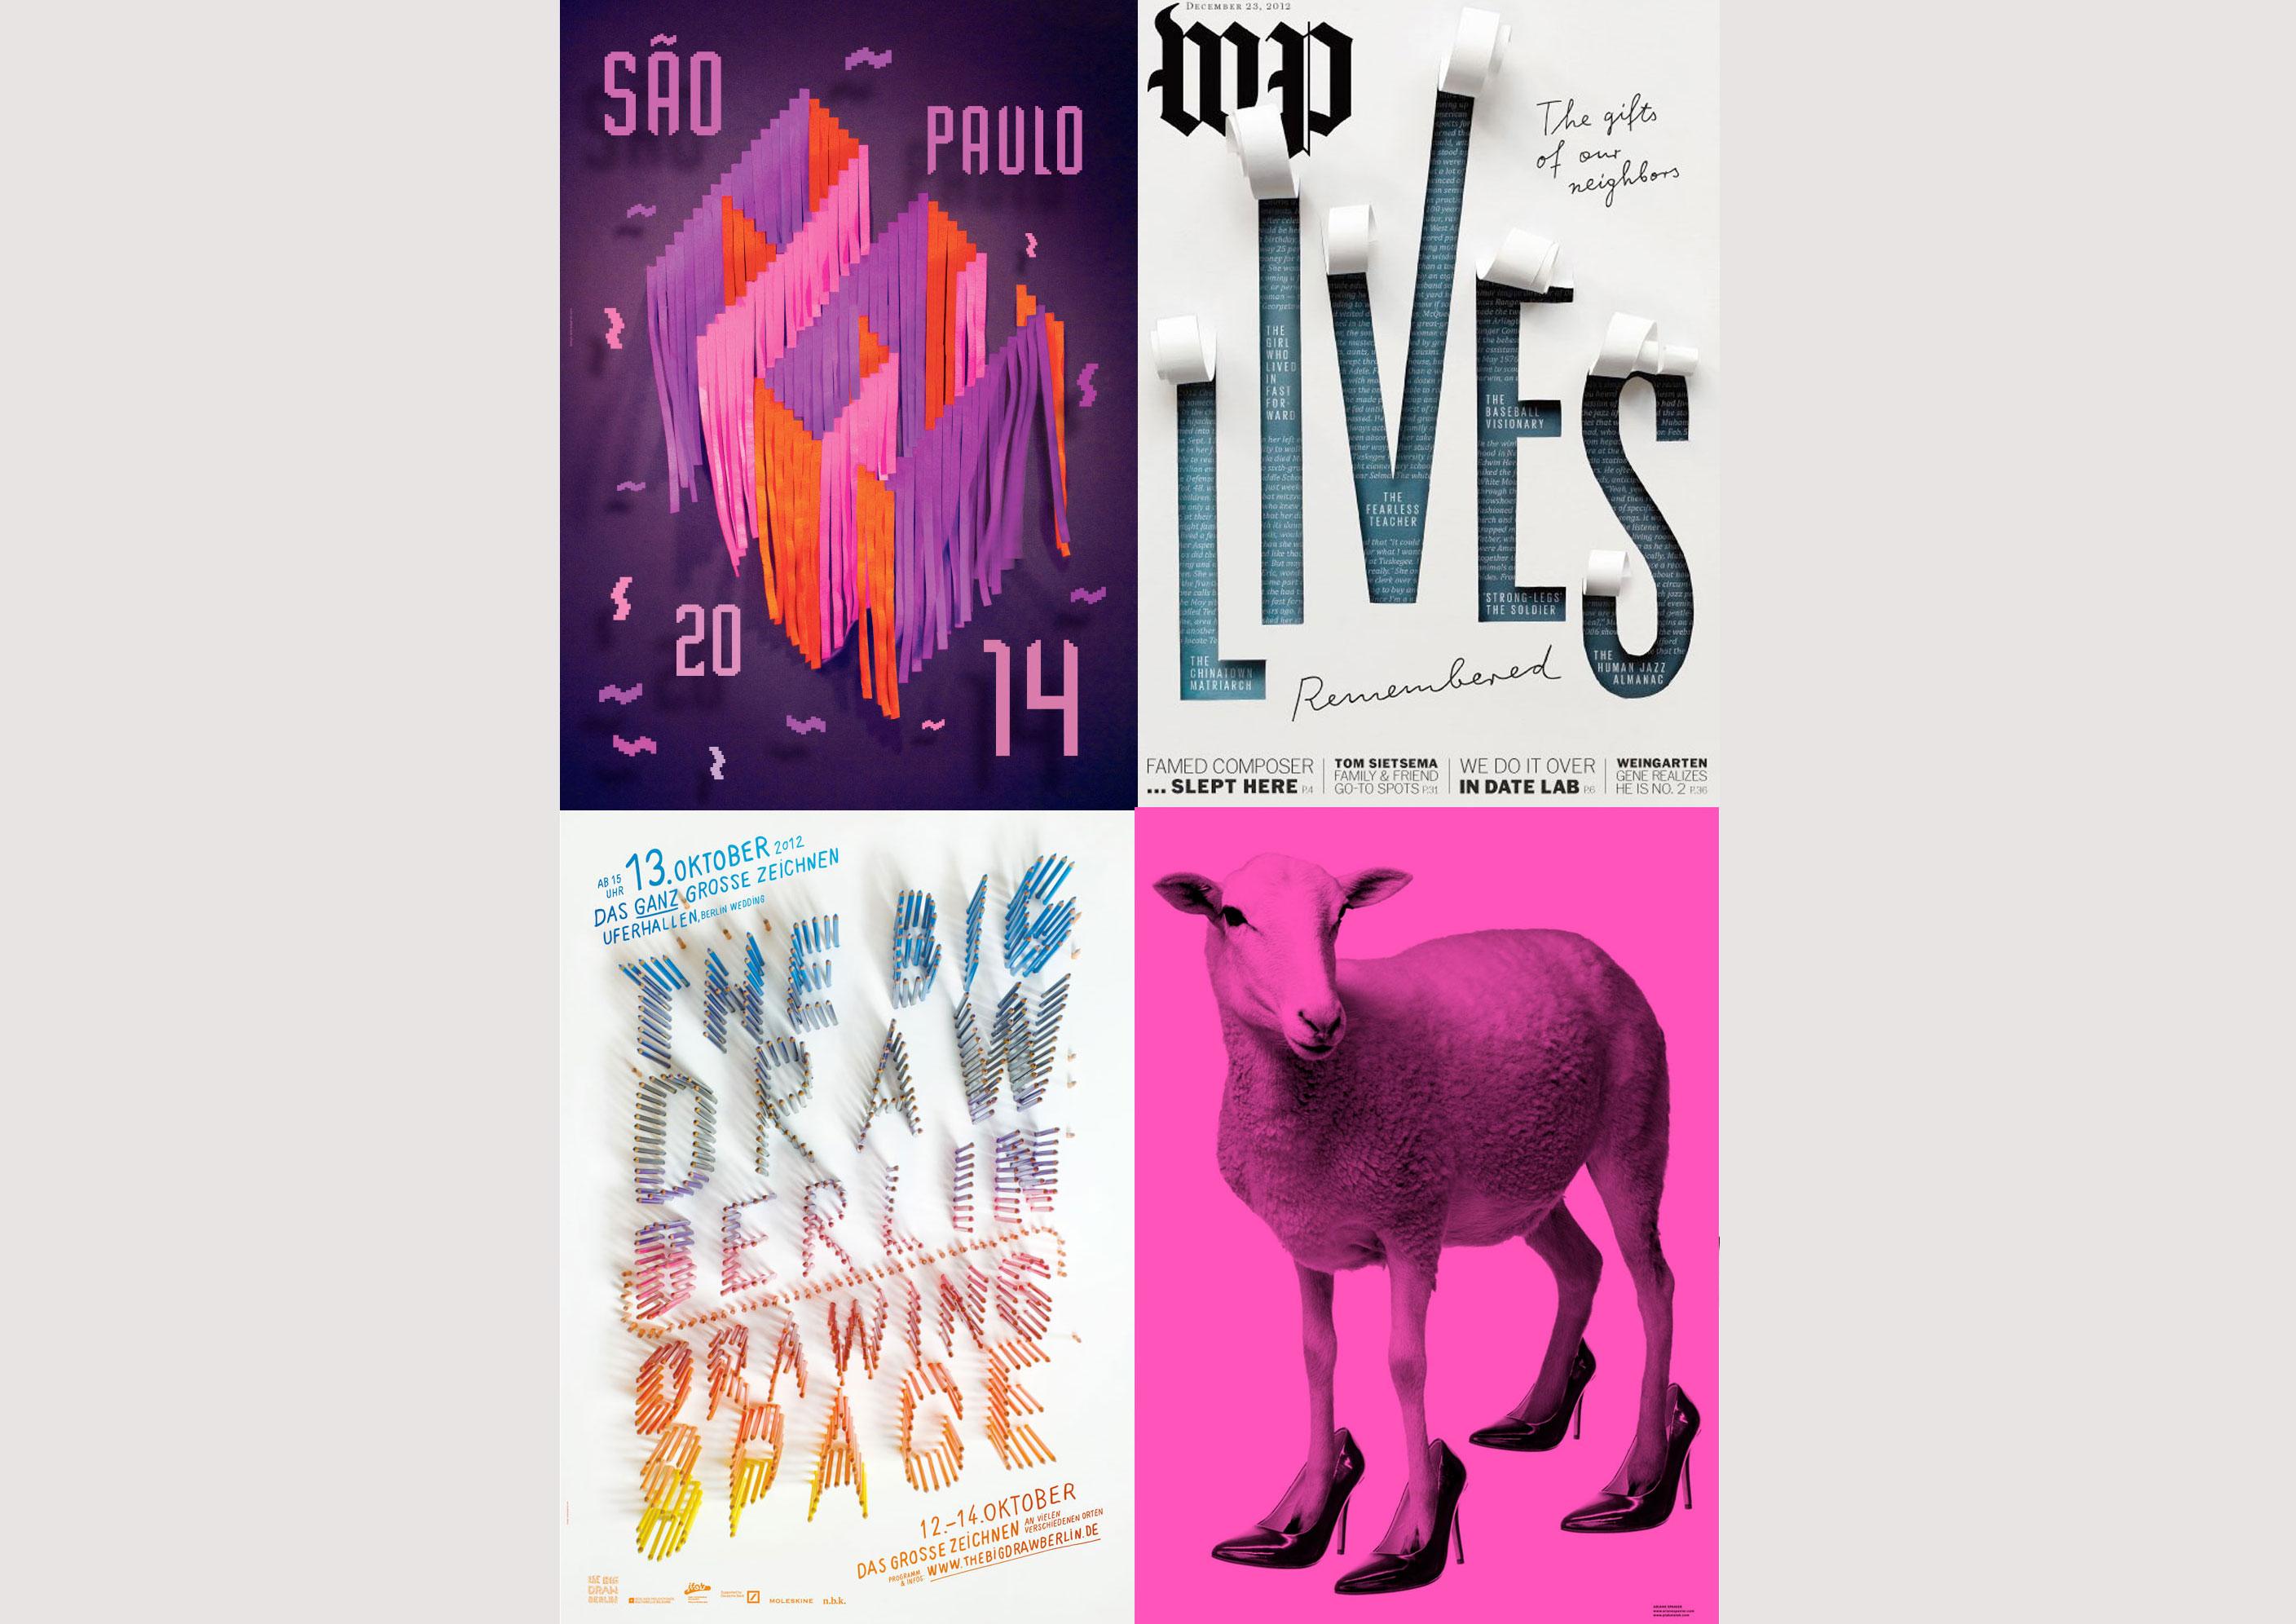 Ariane Spanier posters